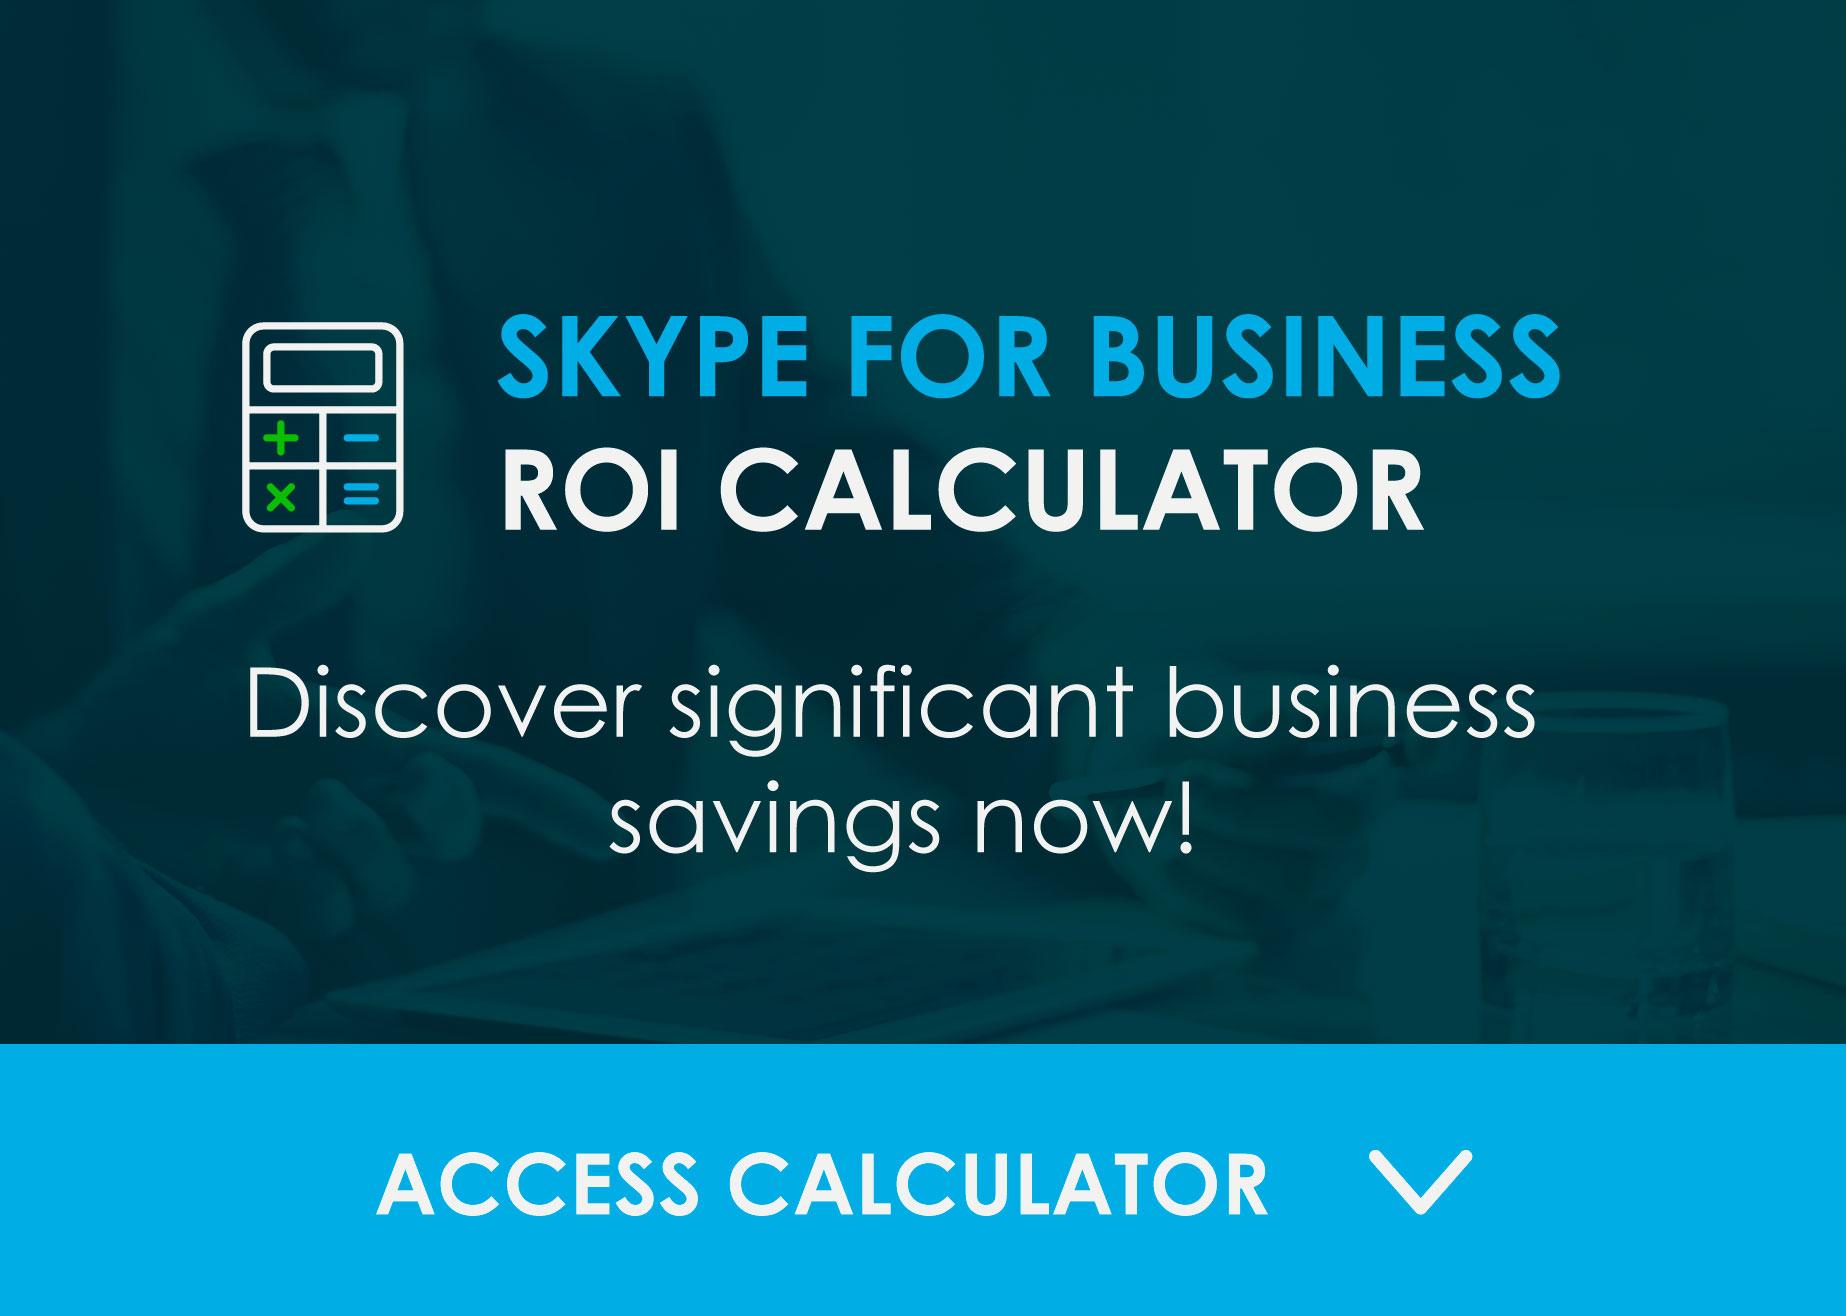 Skype for Business ROI Calculator